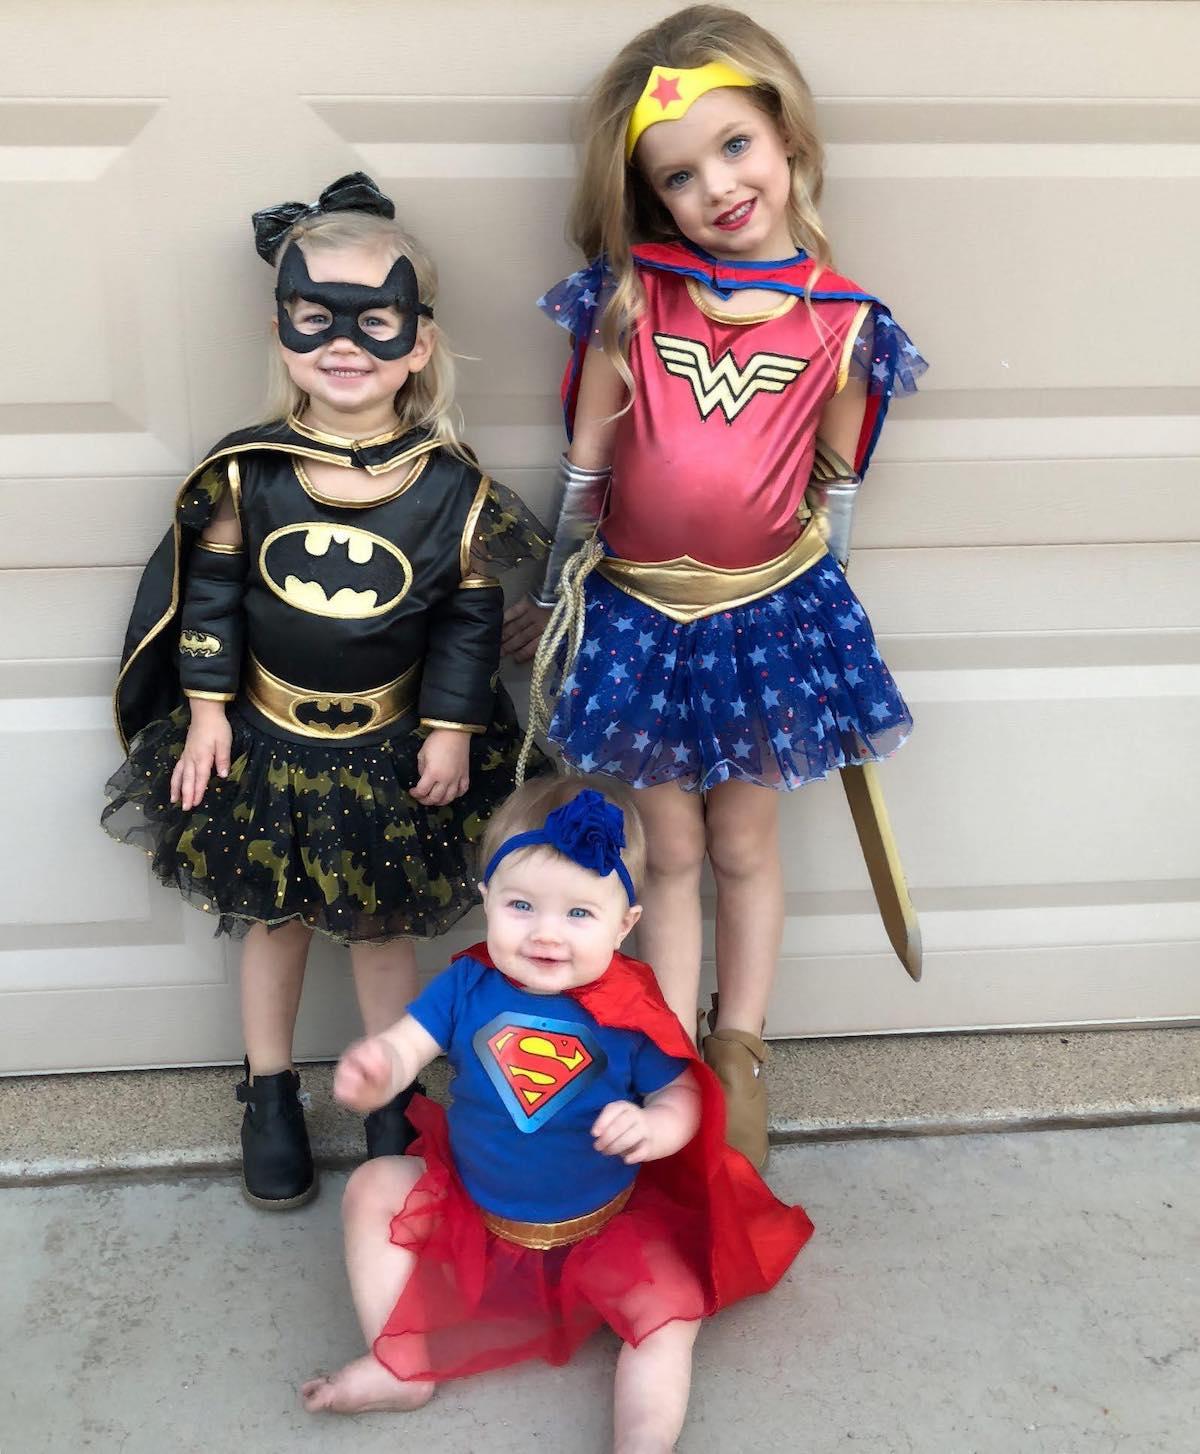 Three girls dresses as superheroes smile in front of beige garage door.